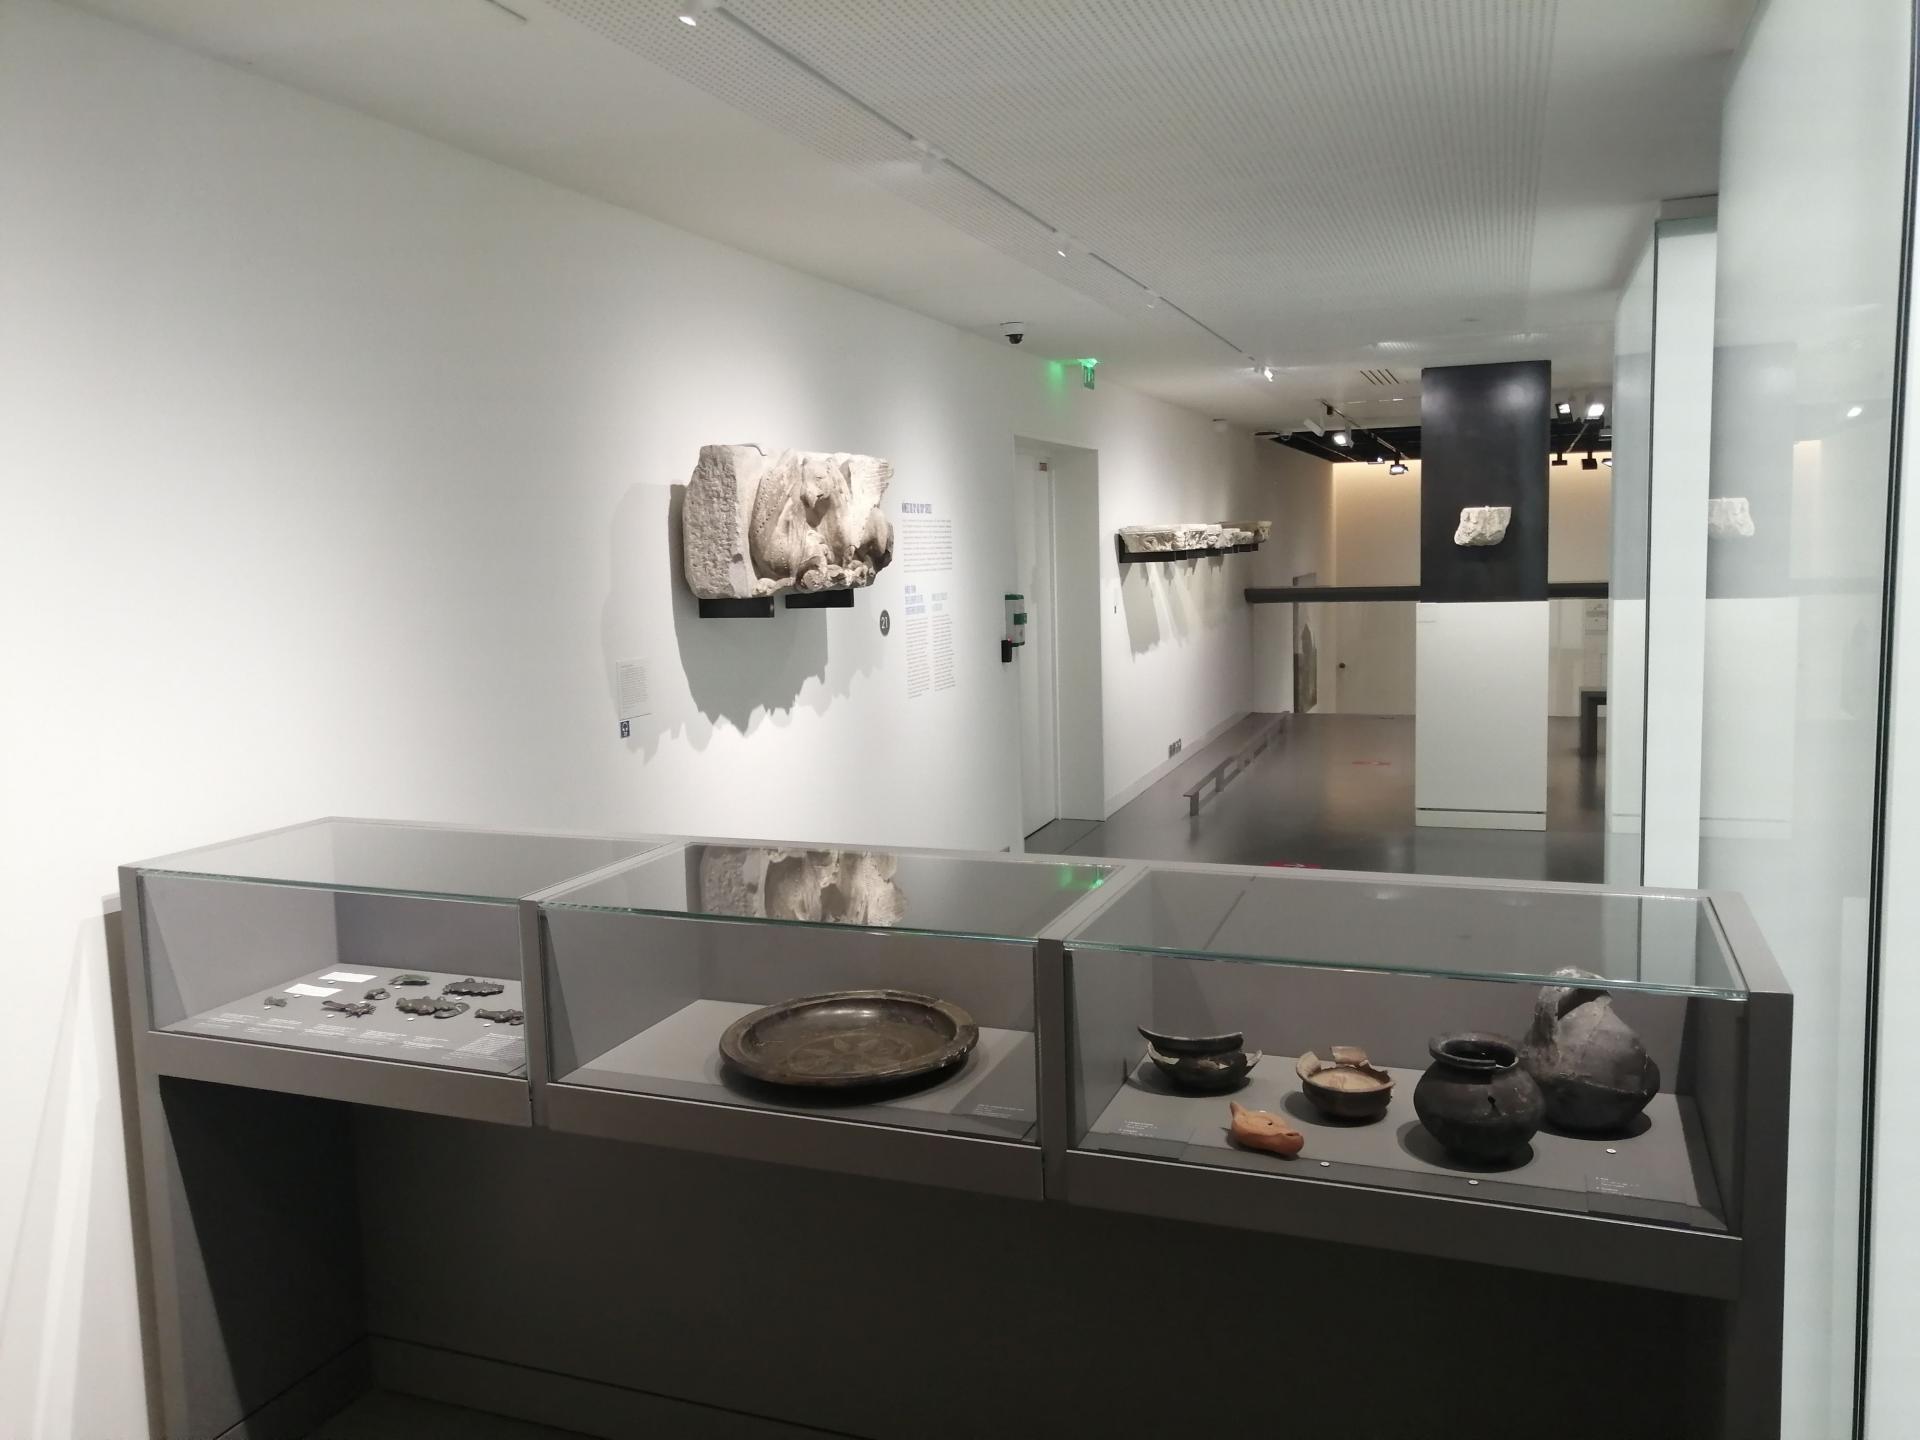 Musee de la romanite 16